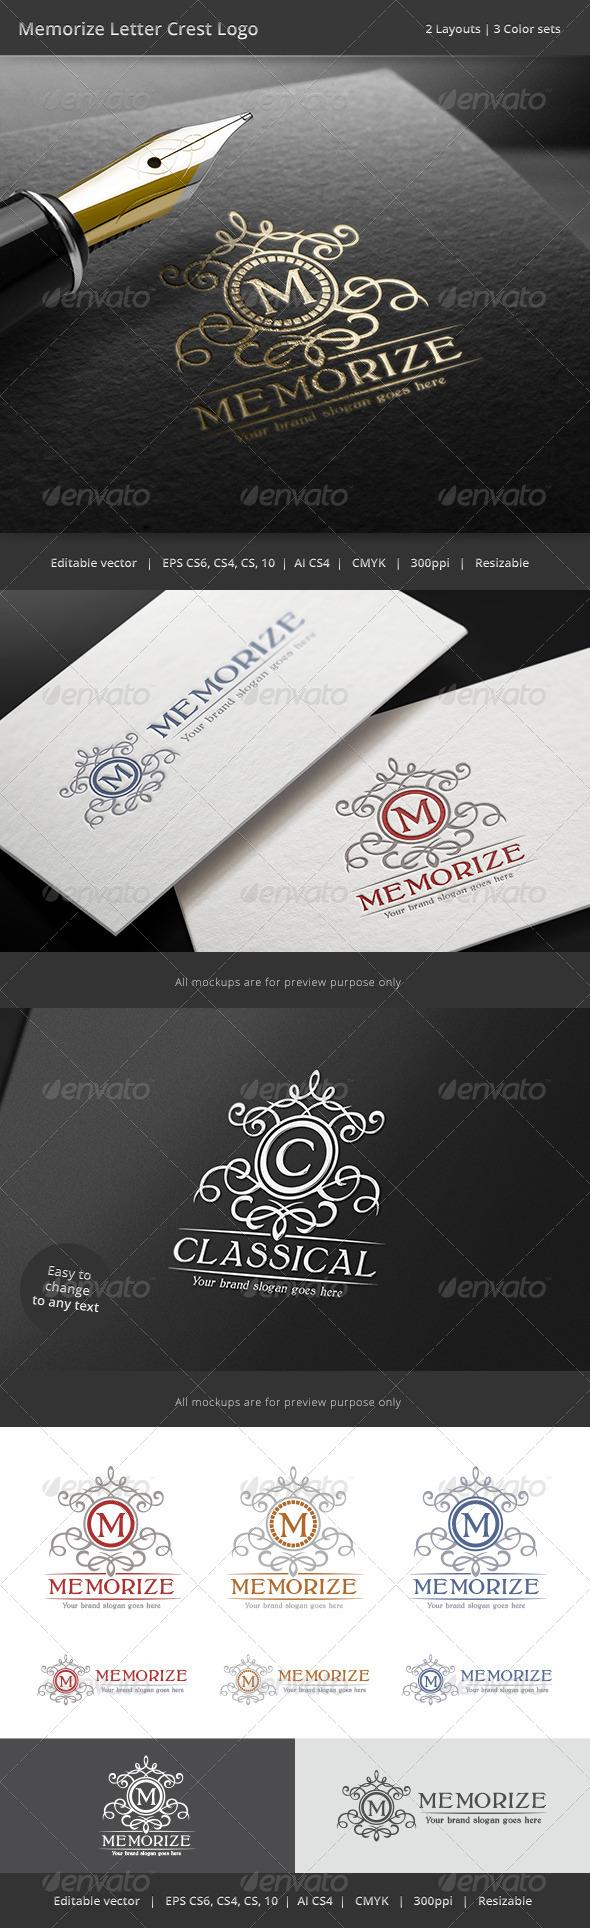 GraphicRiver Memorize Letter Crest Logo 8757486